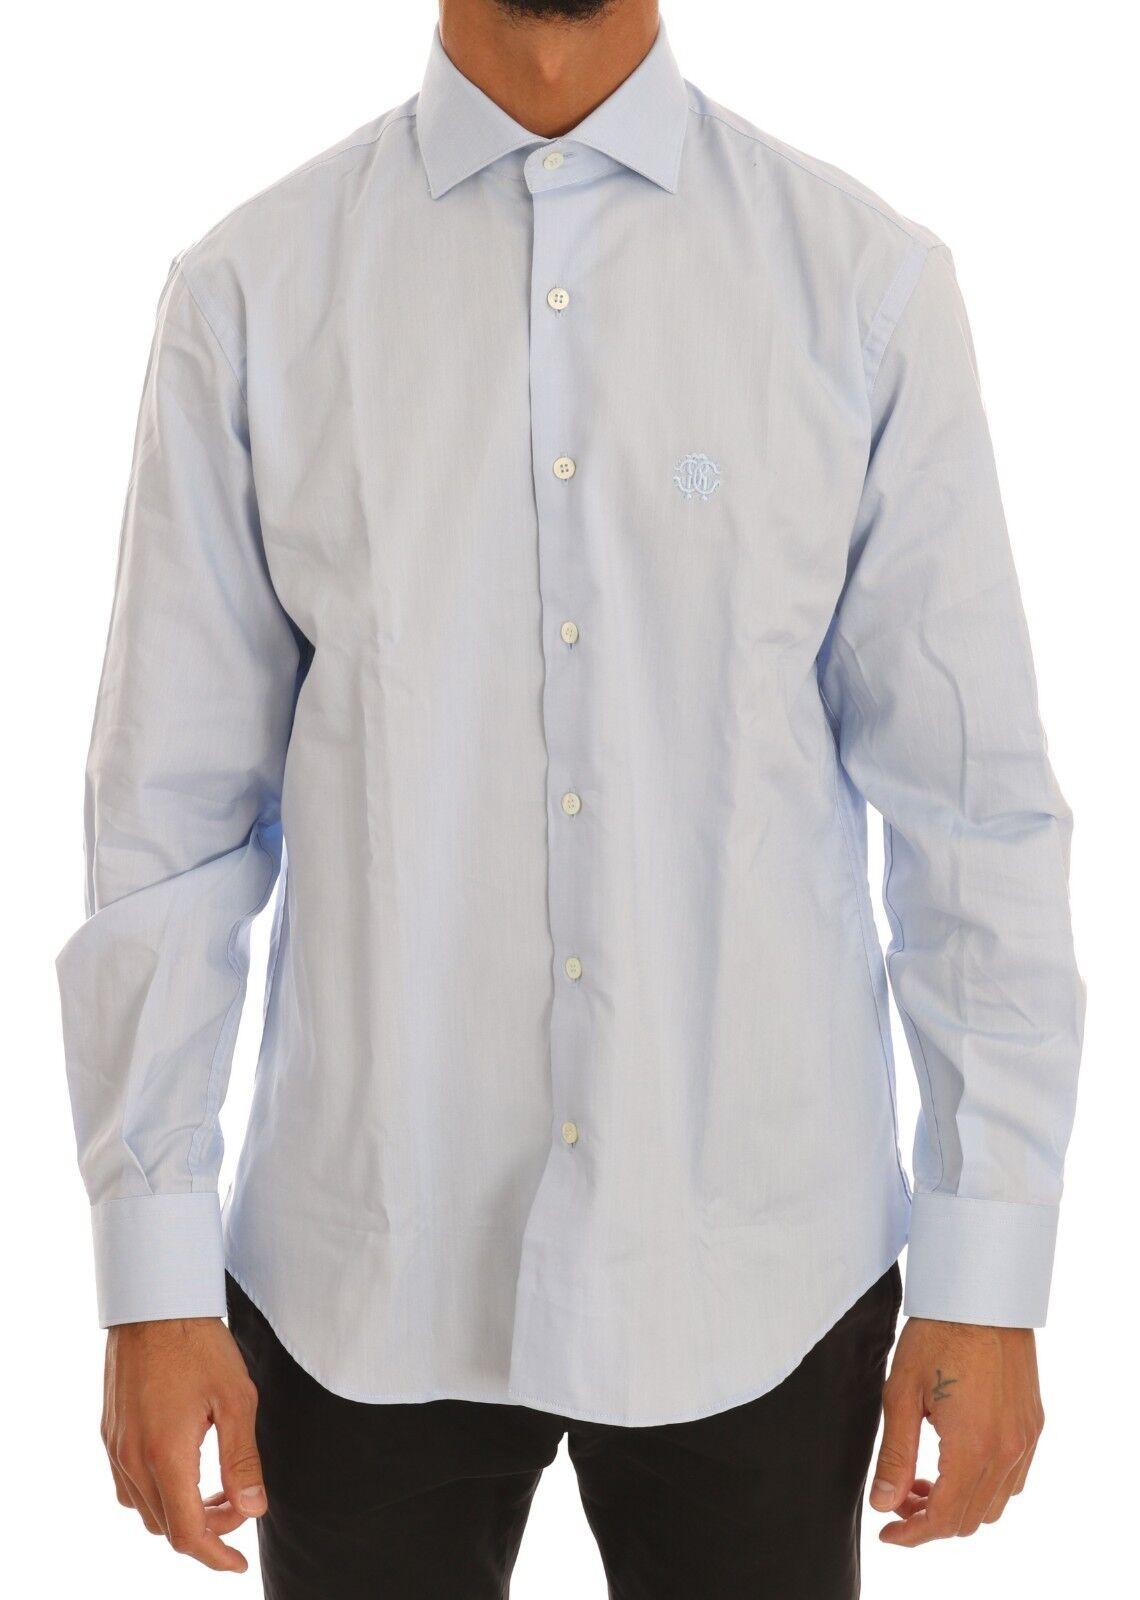 NEW  ROBERTO CAVALLI Shirt Dress Light bluee Cotton Slim Fit IT39   US15.5  S